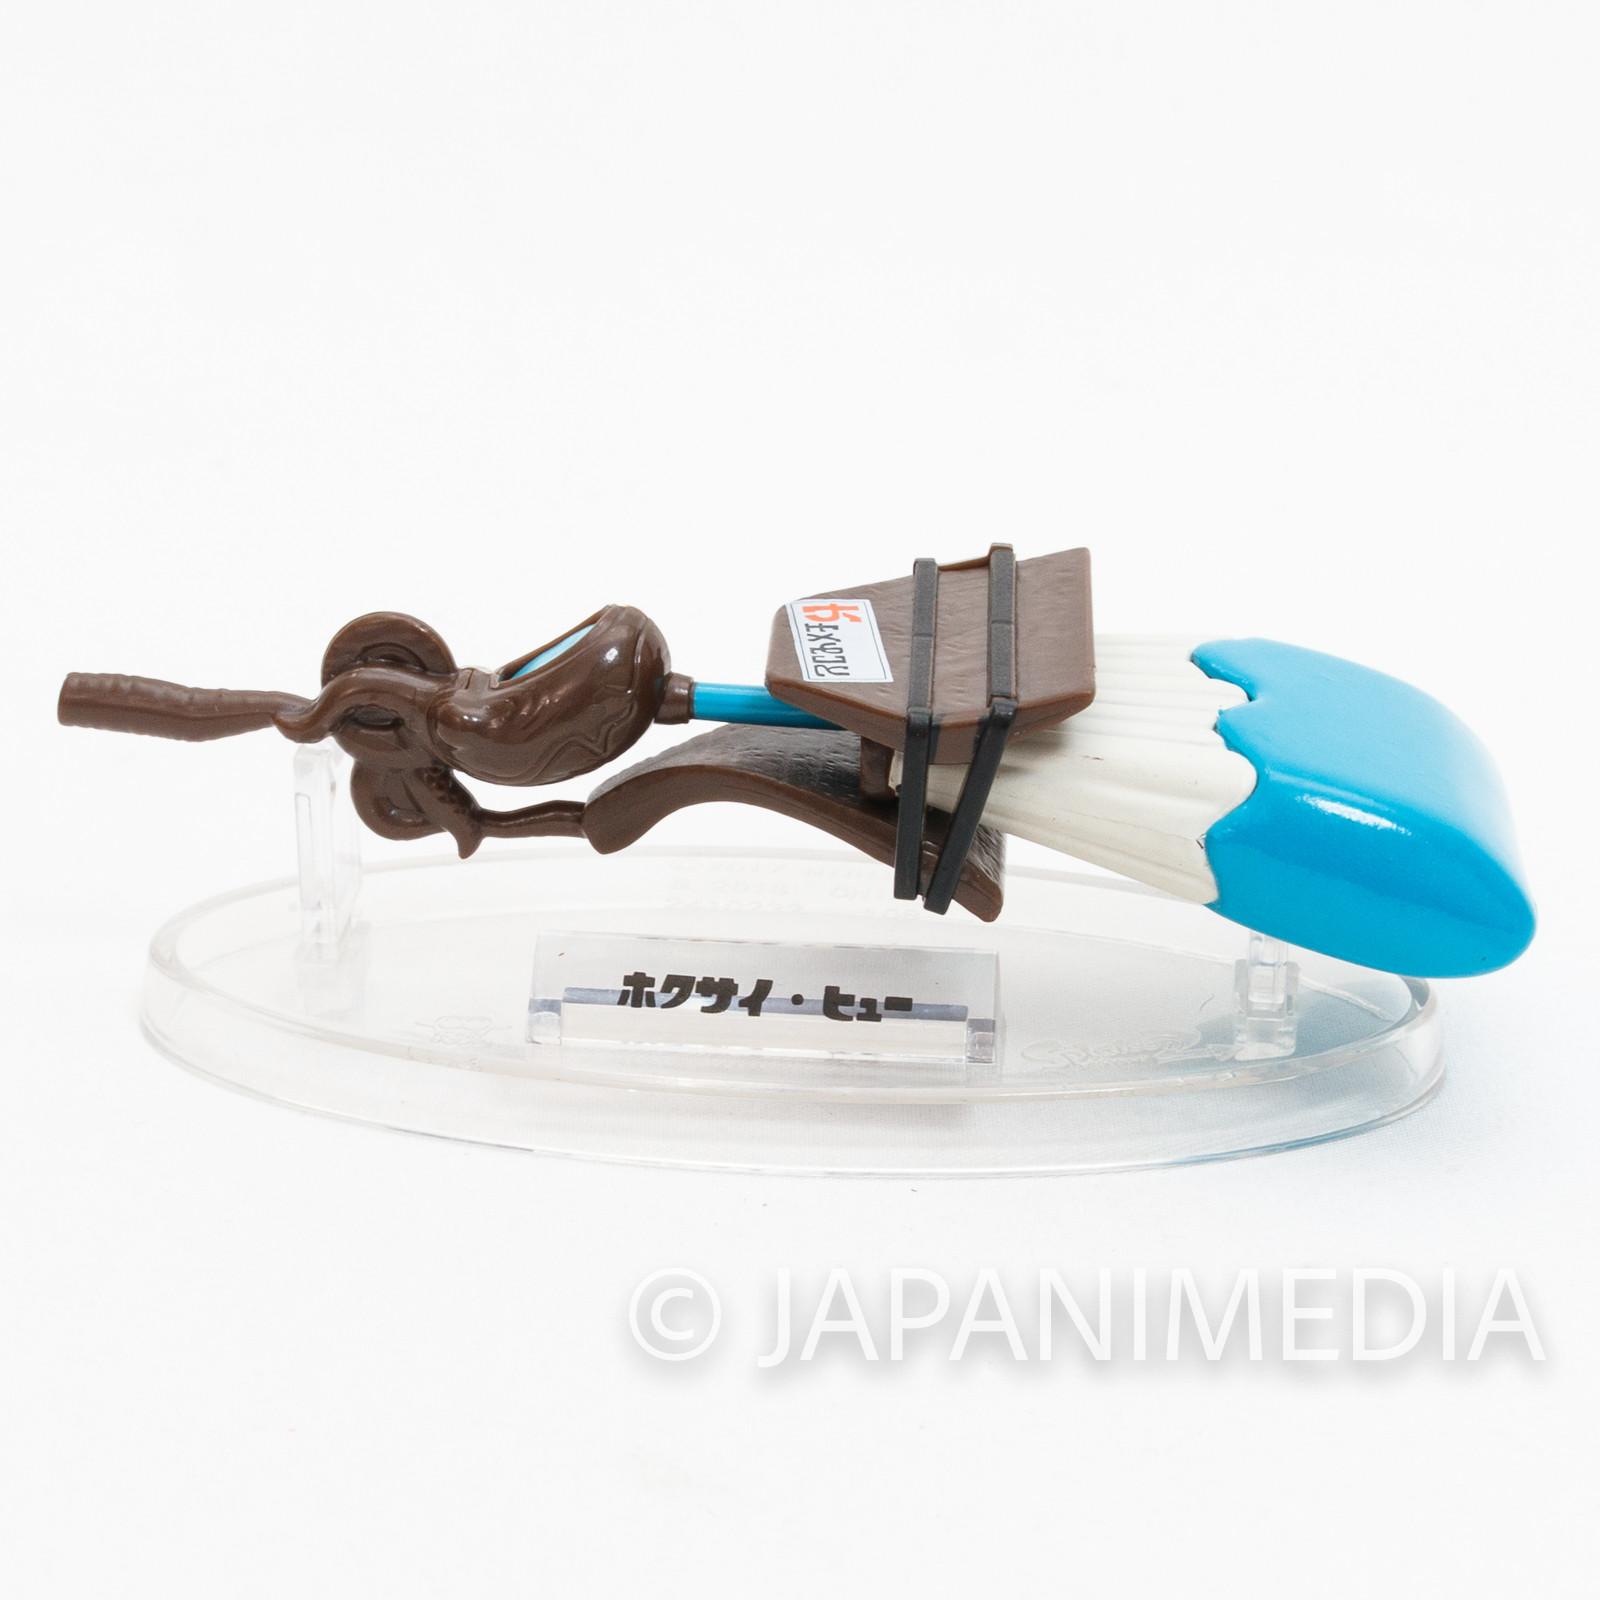 Splatoon 2 Octobrush Nouveau Weapon Figure Collection 2 JAPAN Nintendo Switch